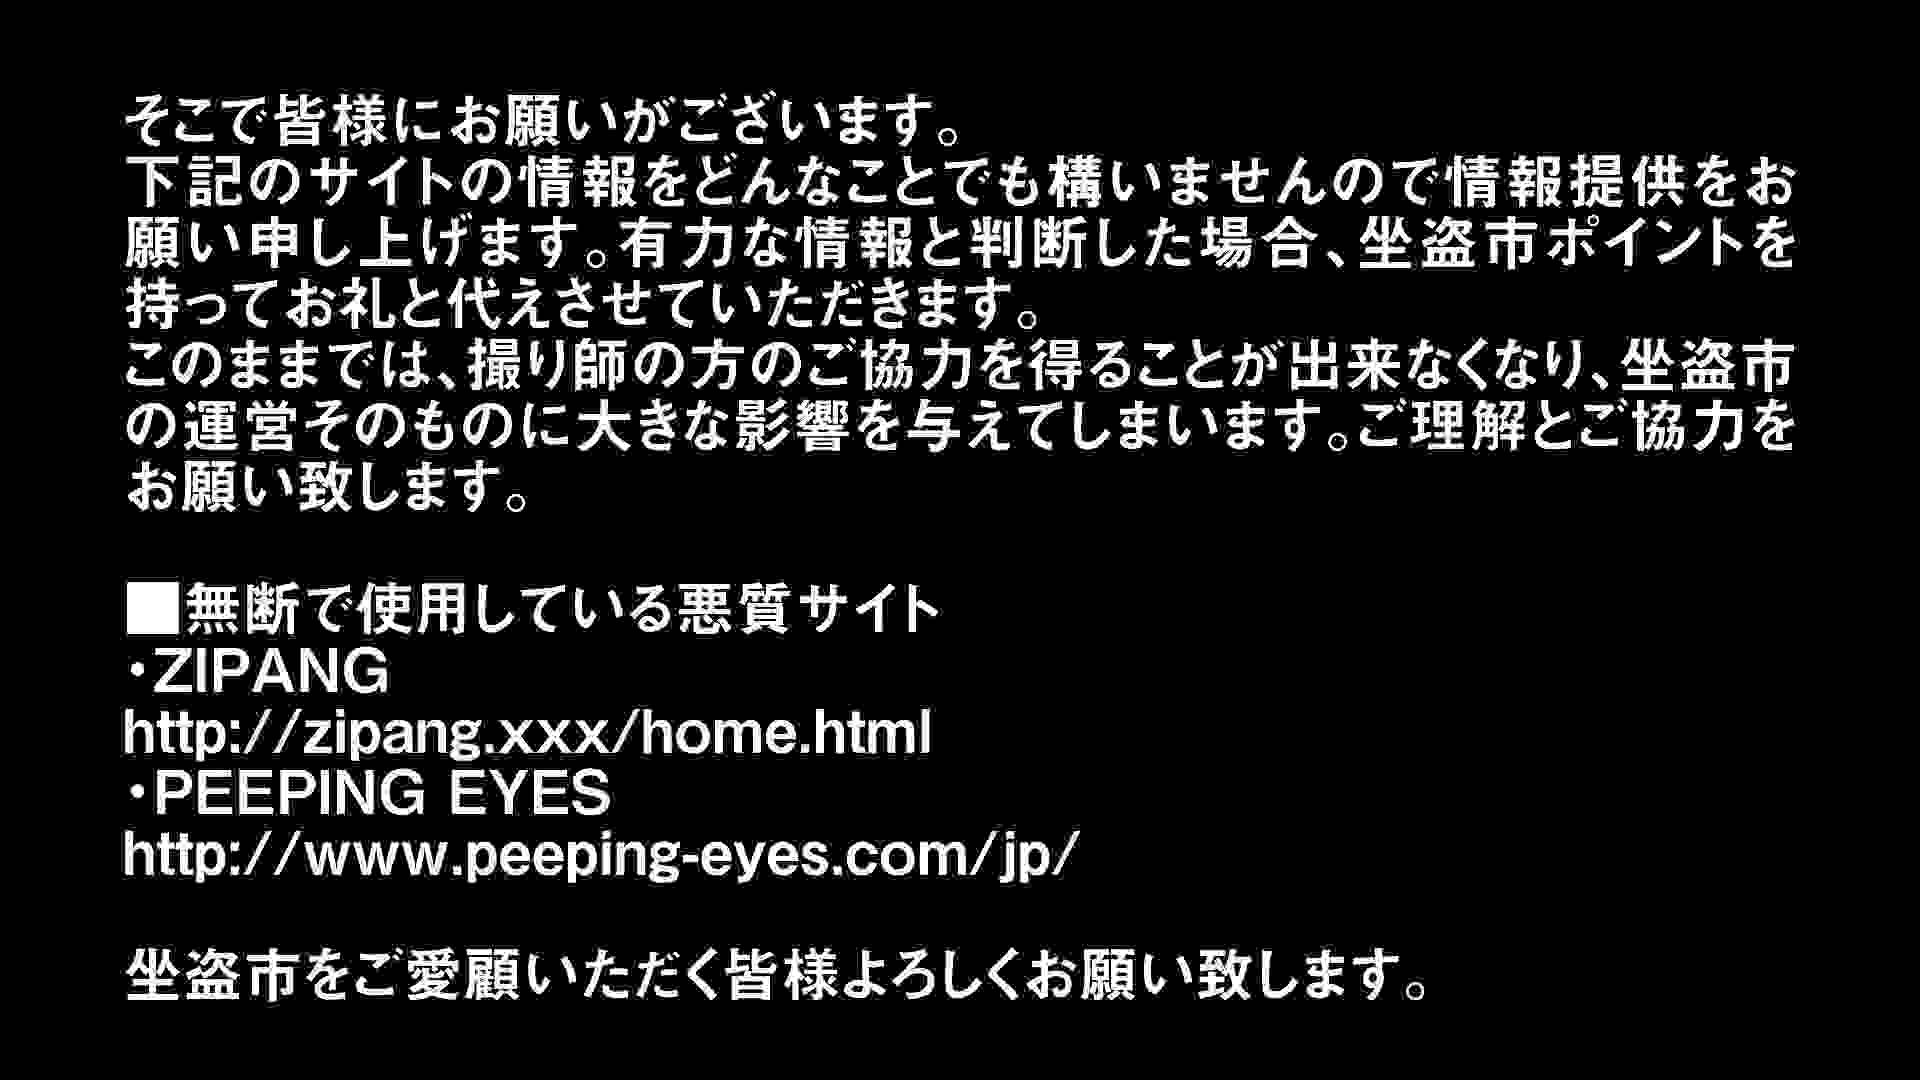 Aquaな露天風呂Vol.296 盗撮 | OLセックス  91画像 31